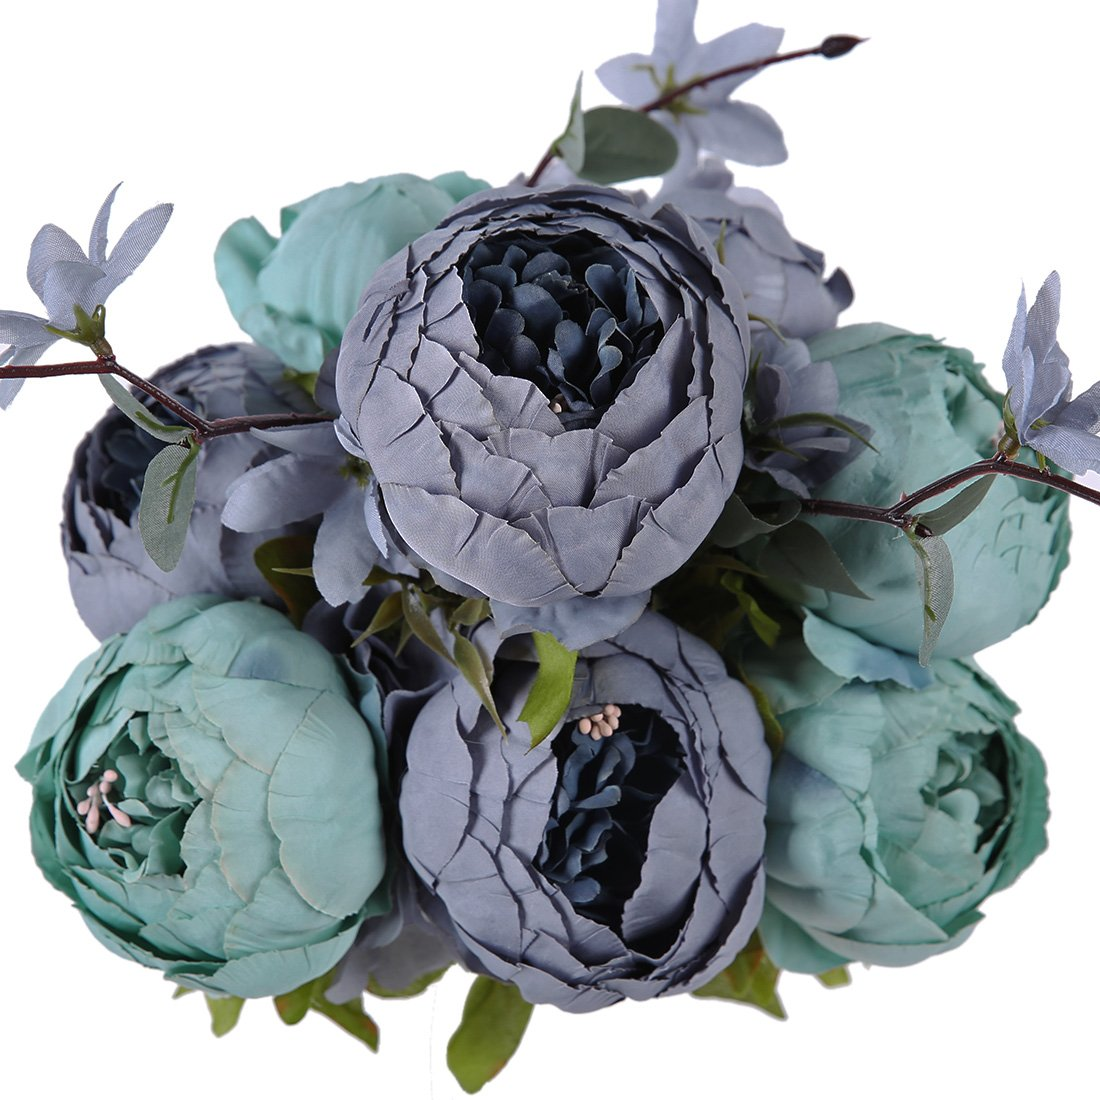 (New Dark Blue) - Luyue Vintage Artificial Peony Silk Flowers Bouquet, New Dark Blue B01M6UL8UO New Dark Blue